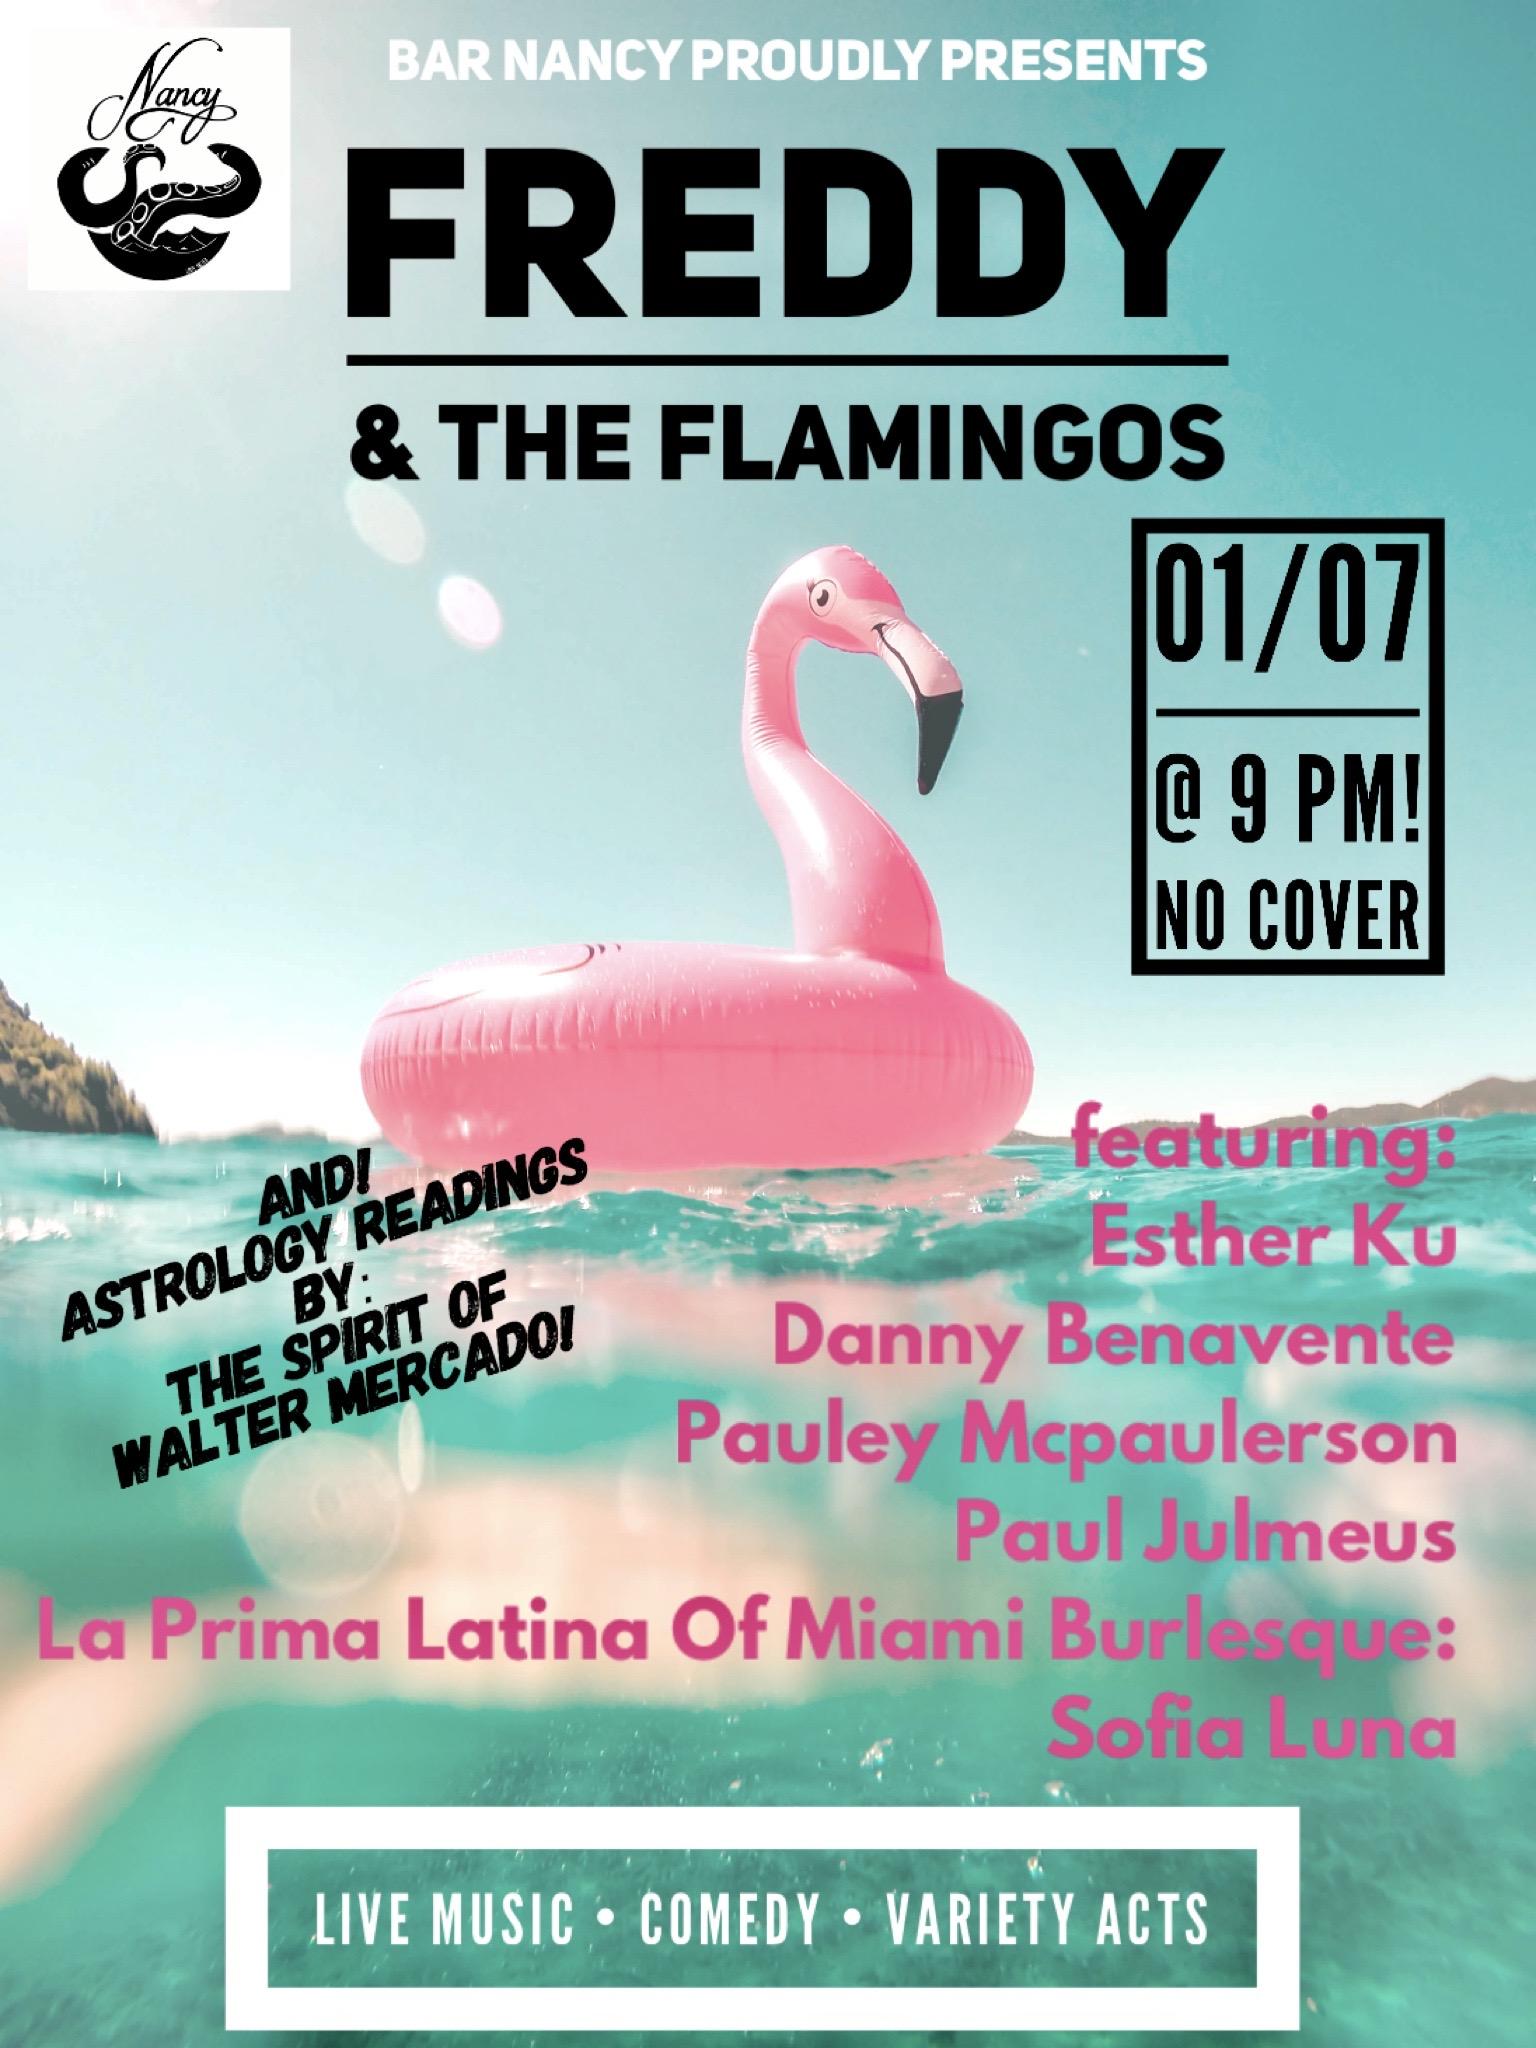 Freddy & The Flamingos! Comedy! Live Music! Variety Show! @ Bar Nancy